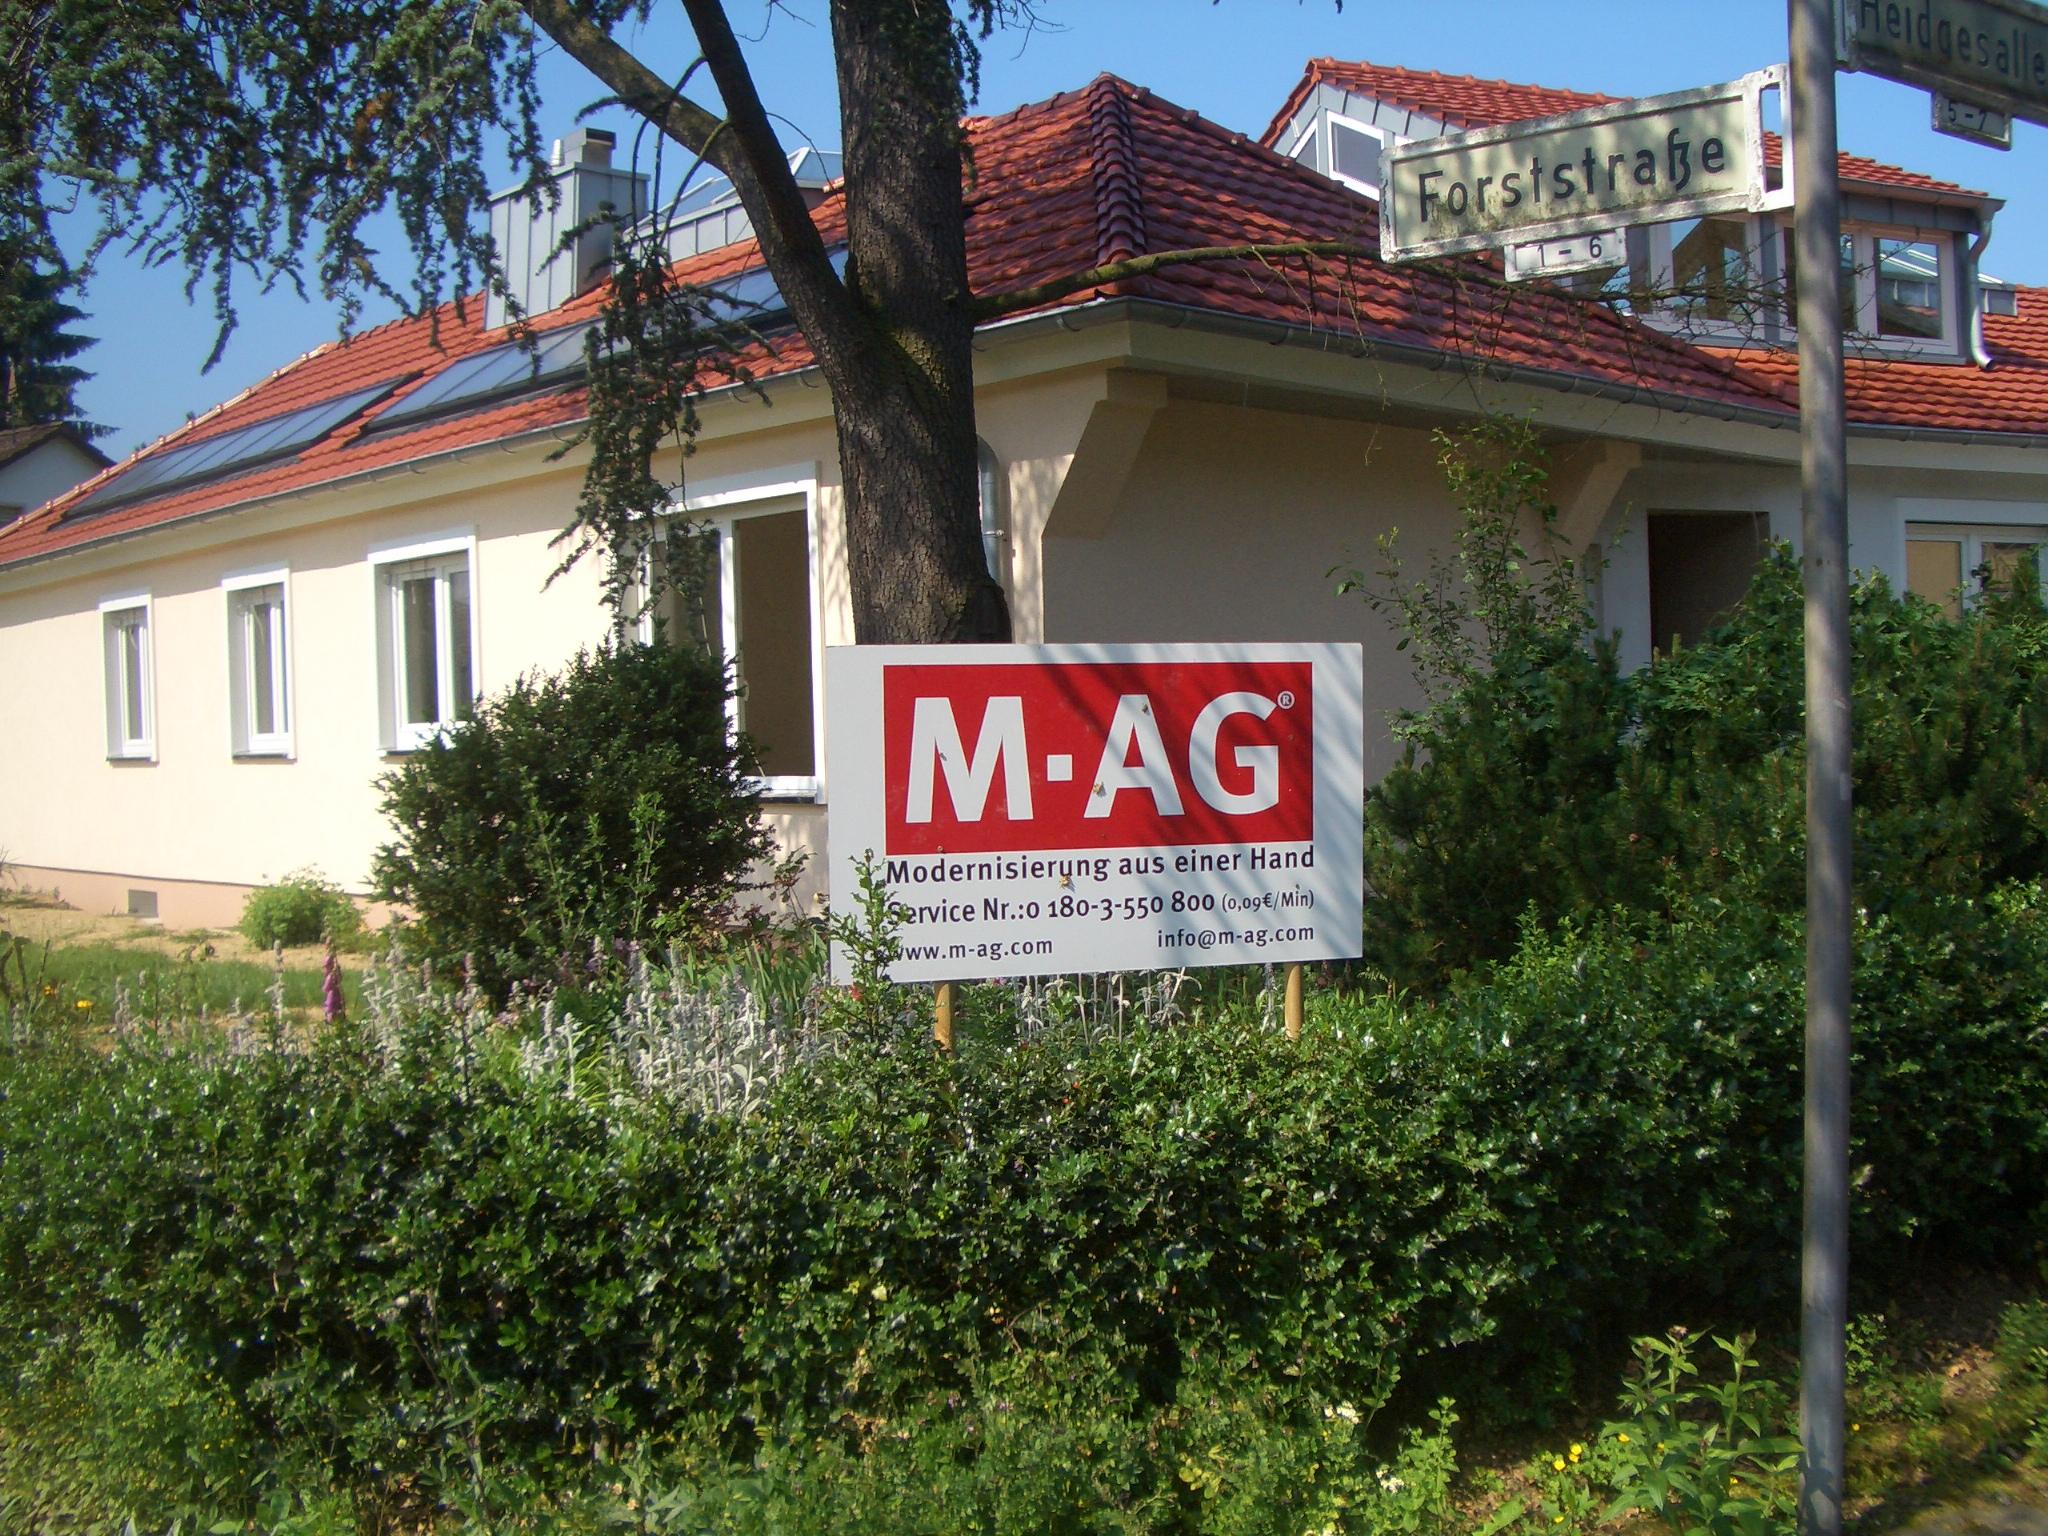 Altbausanierung, Hausrenovierung, Kernsanierung | m-ag